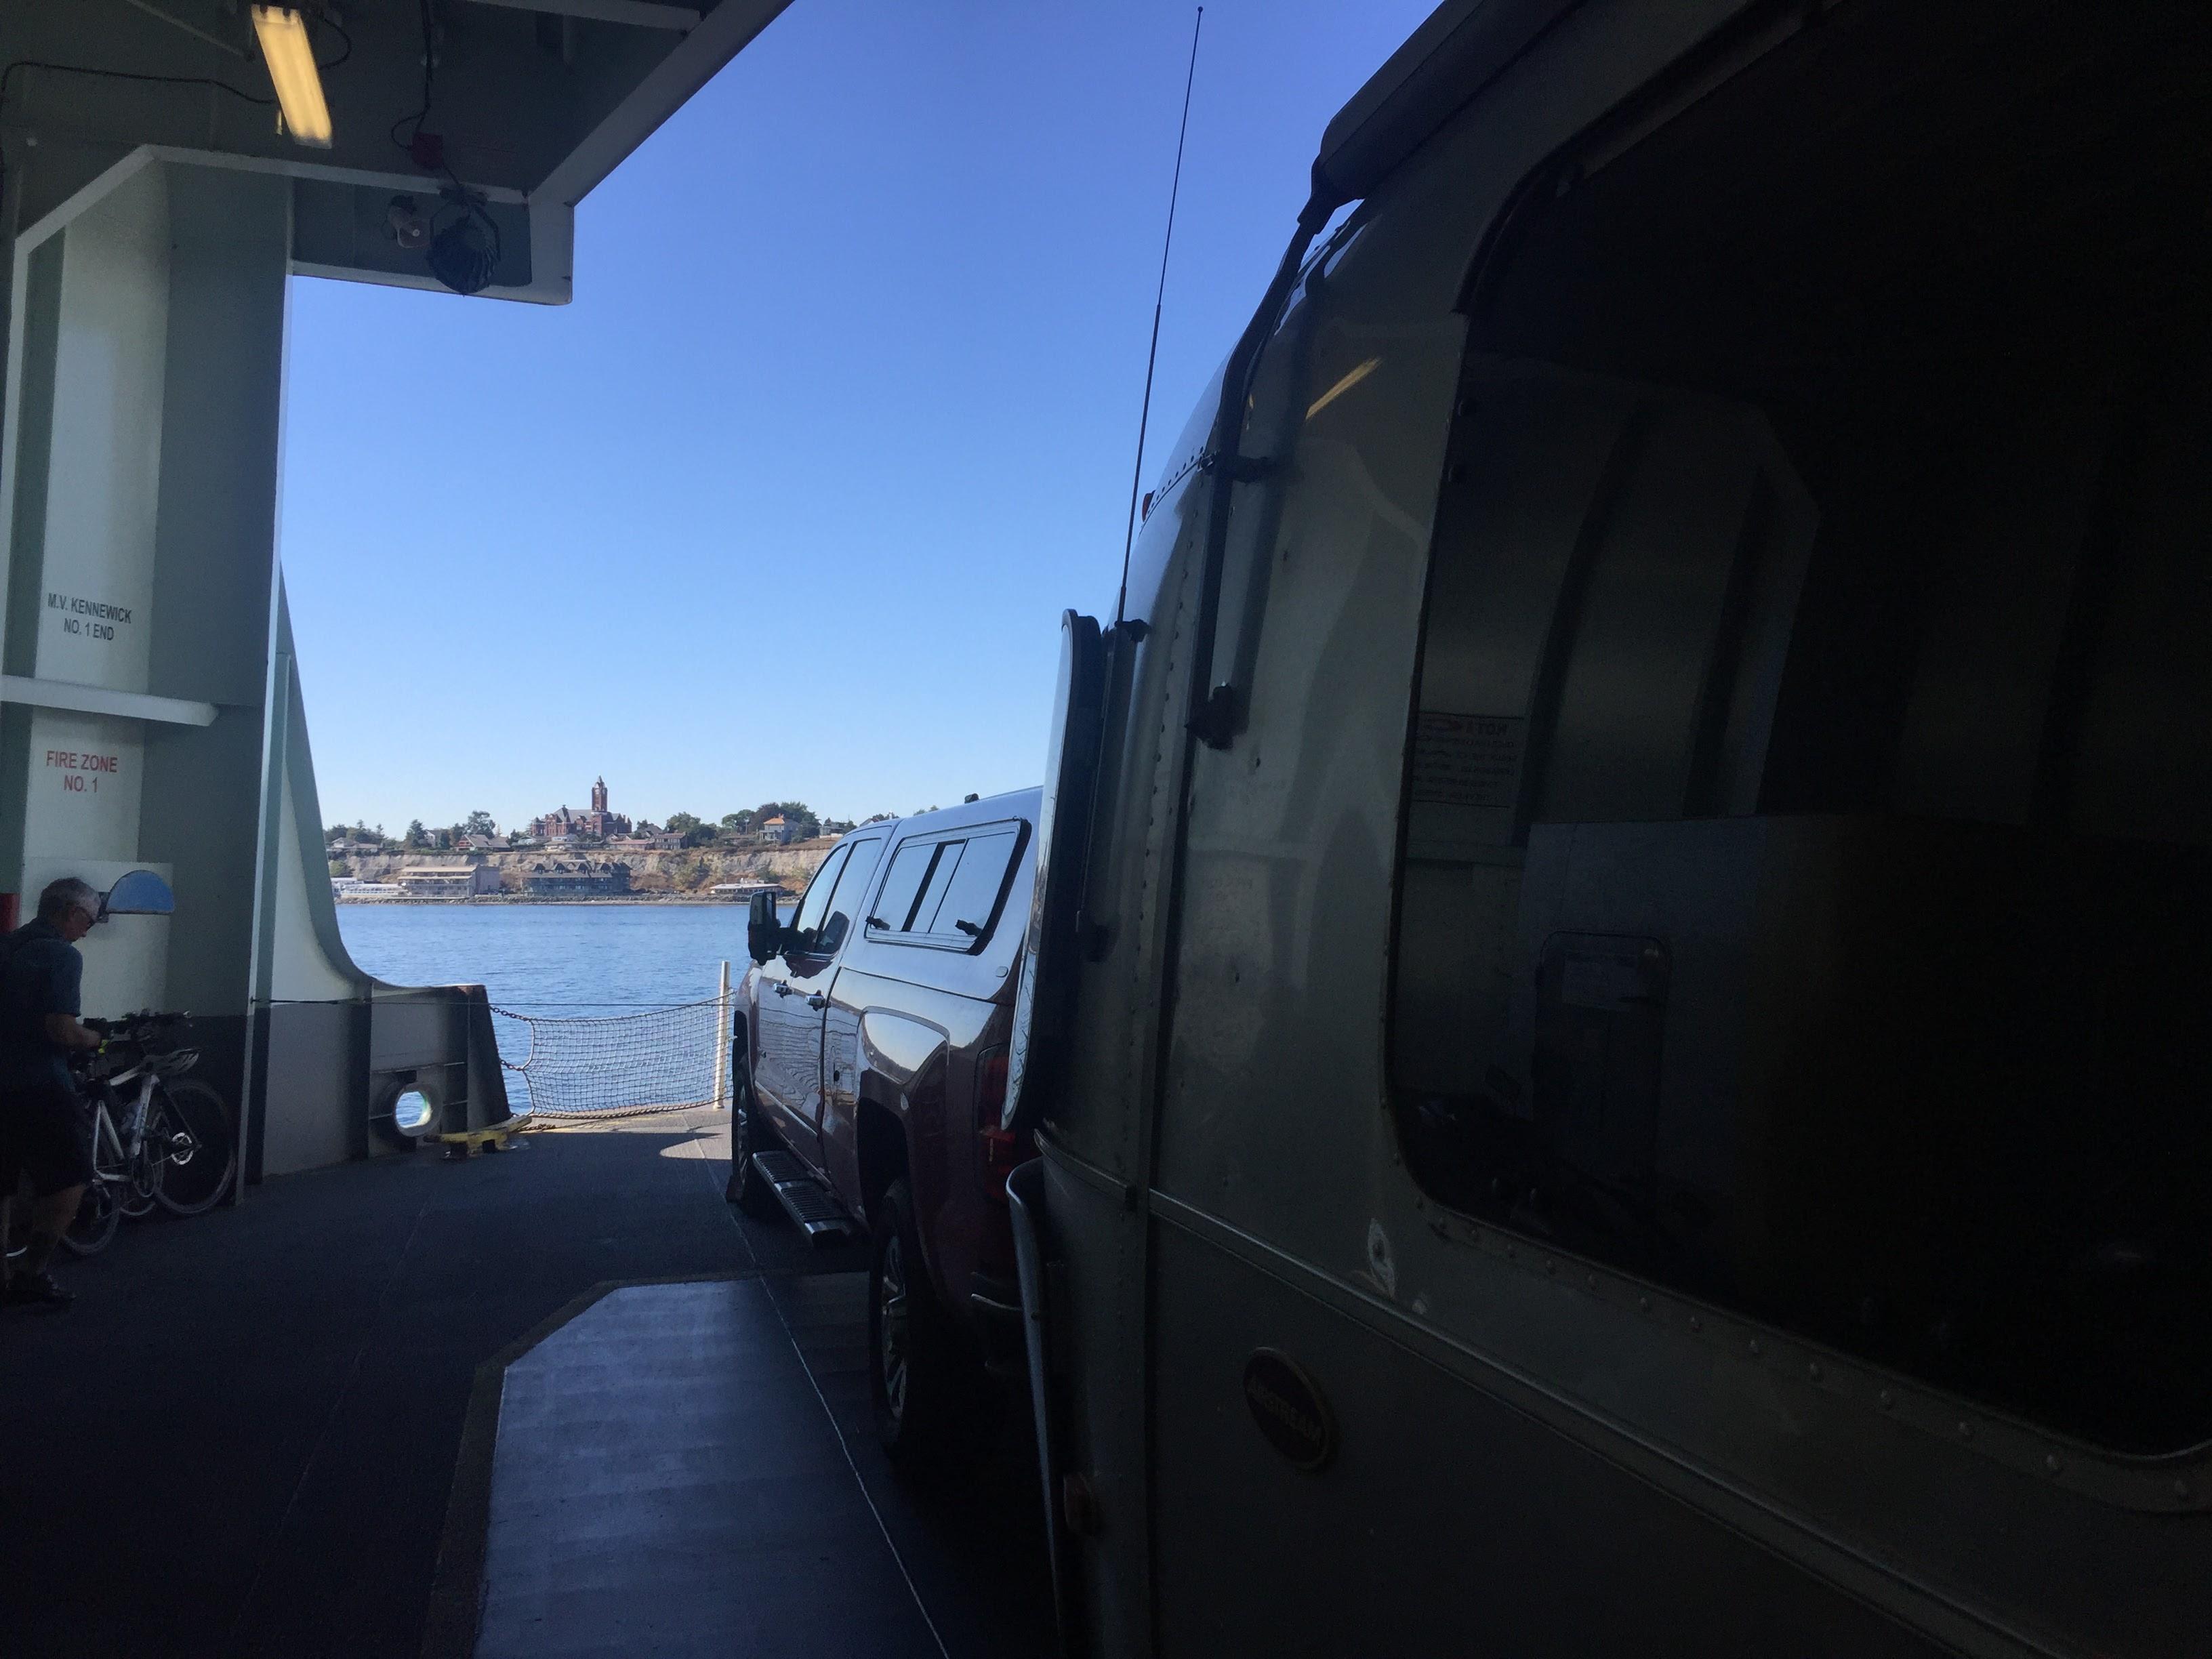 2017-09-28 Washington 01 Ferry 06